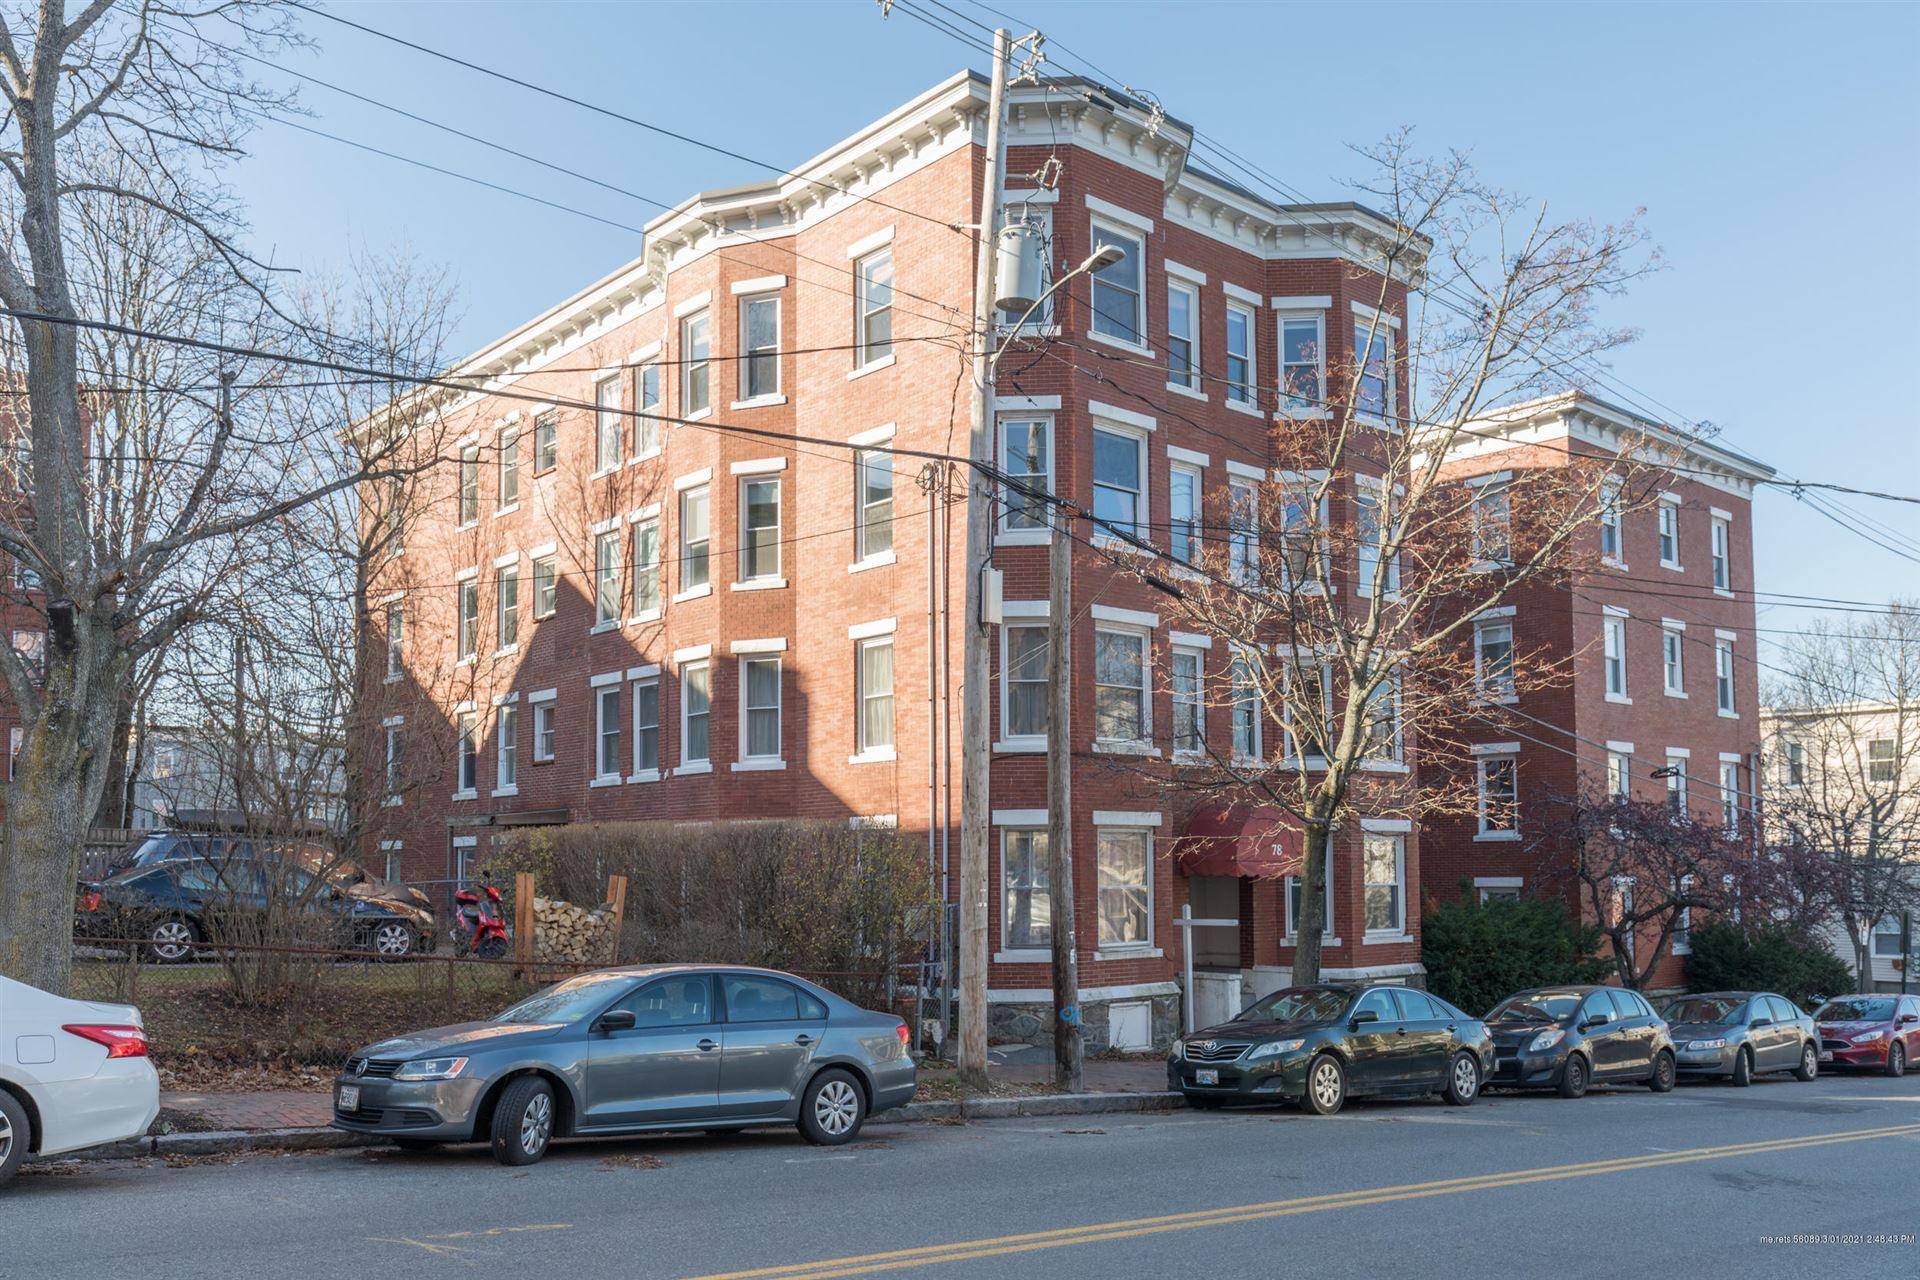 Photo of 78 Mellen Street #2, Portland, ME 04101 (MLS # 1477604)